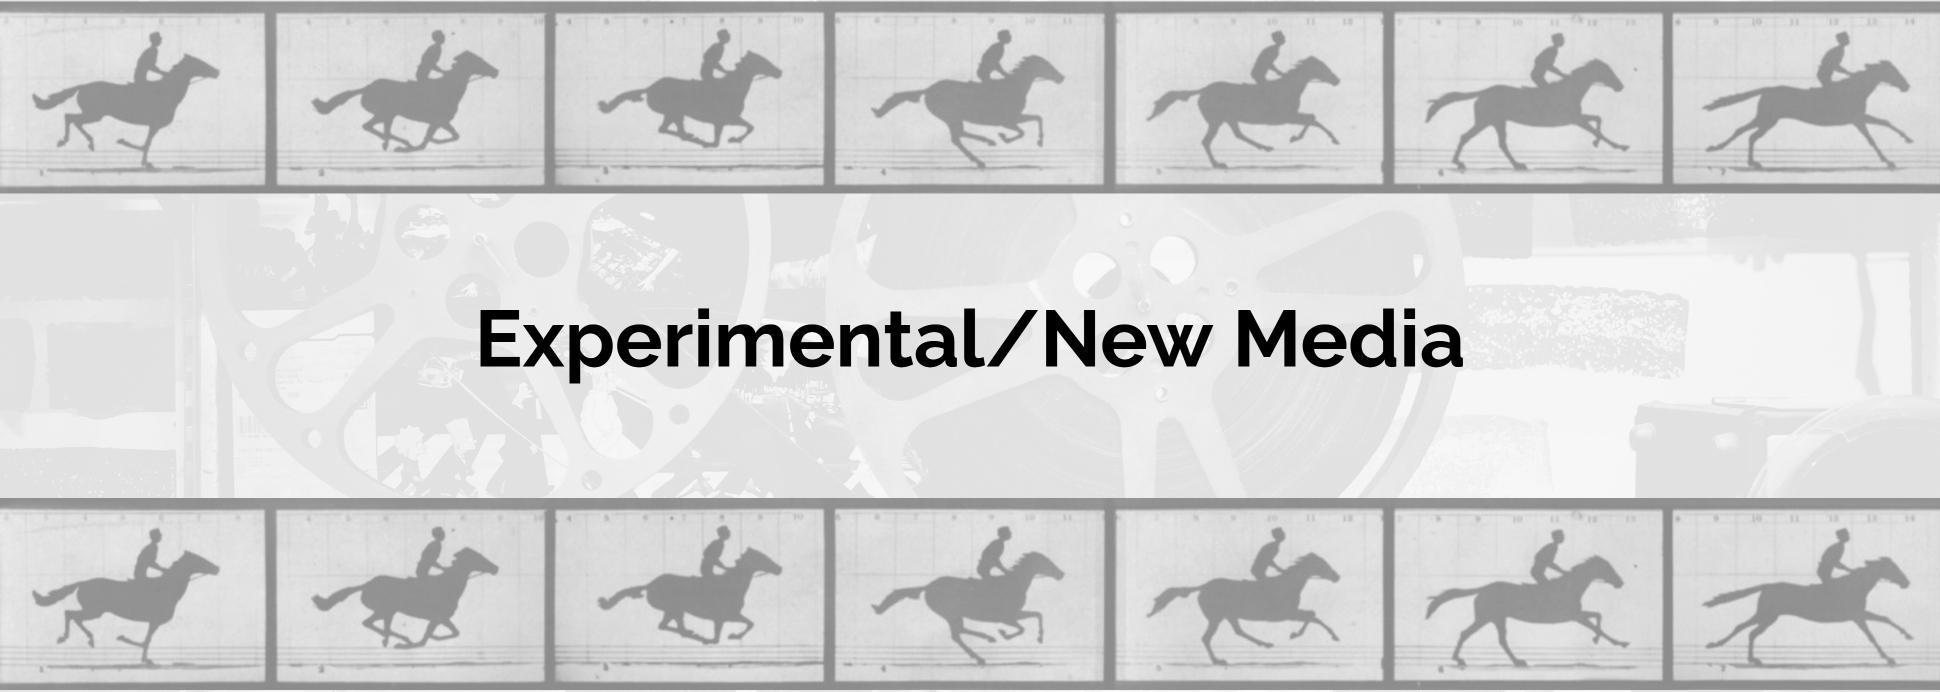 Experimental/New Media